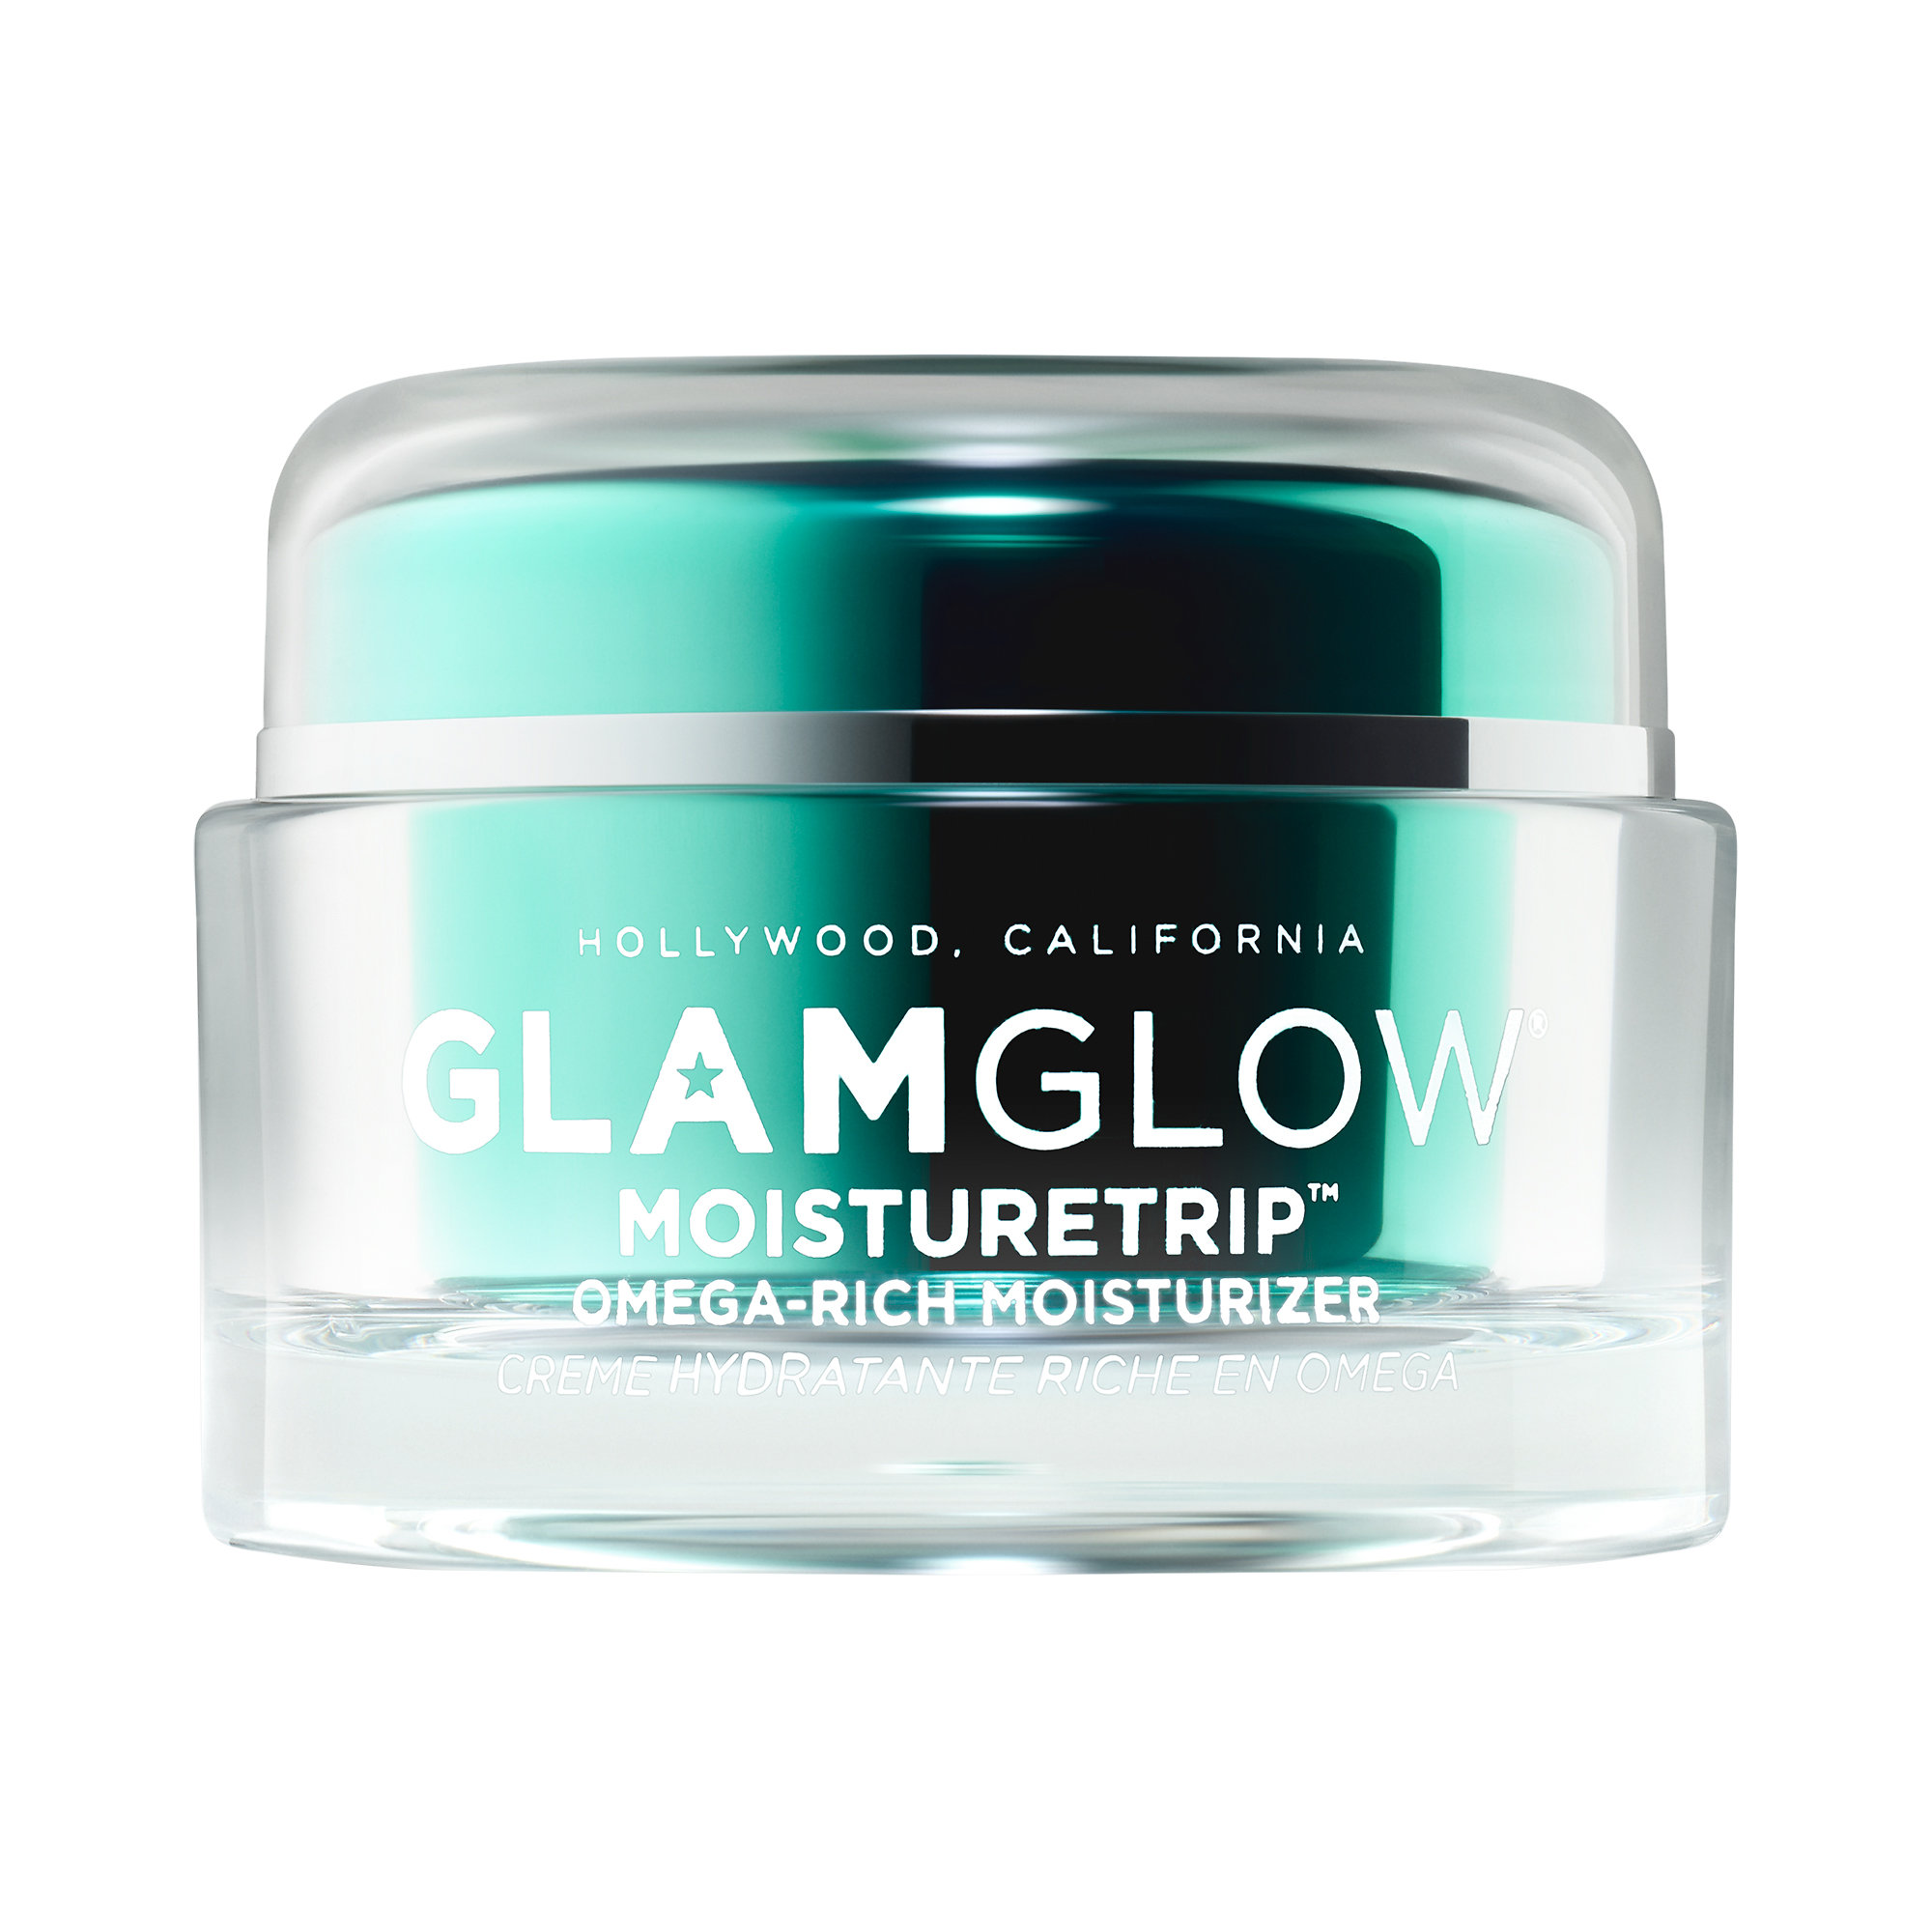 Glamglow - MOISTURETRIP™ Omega-Rich Face Moisturizer